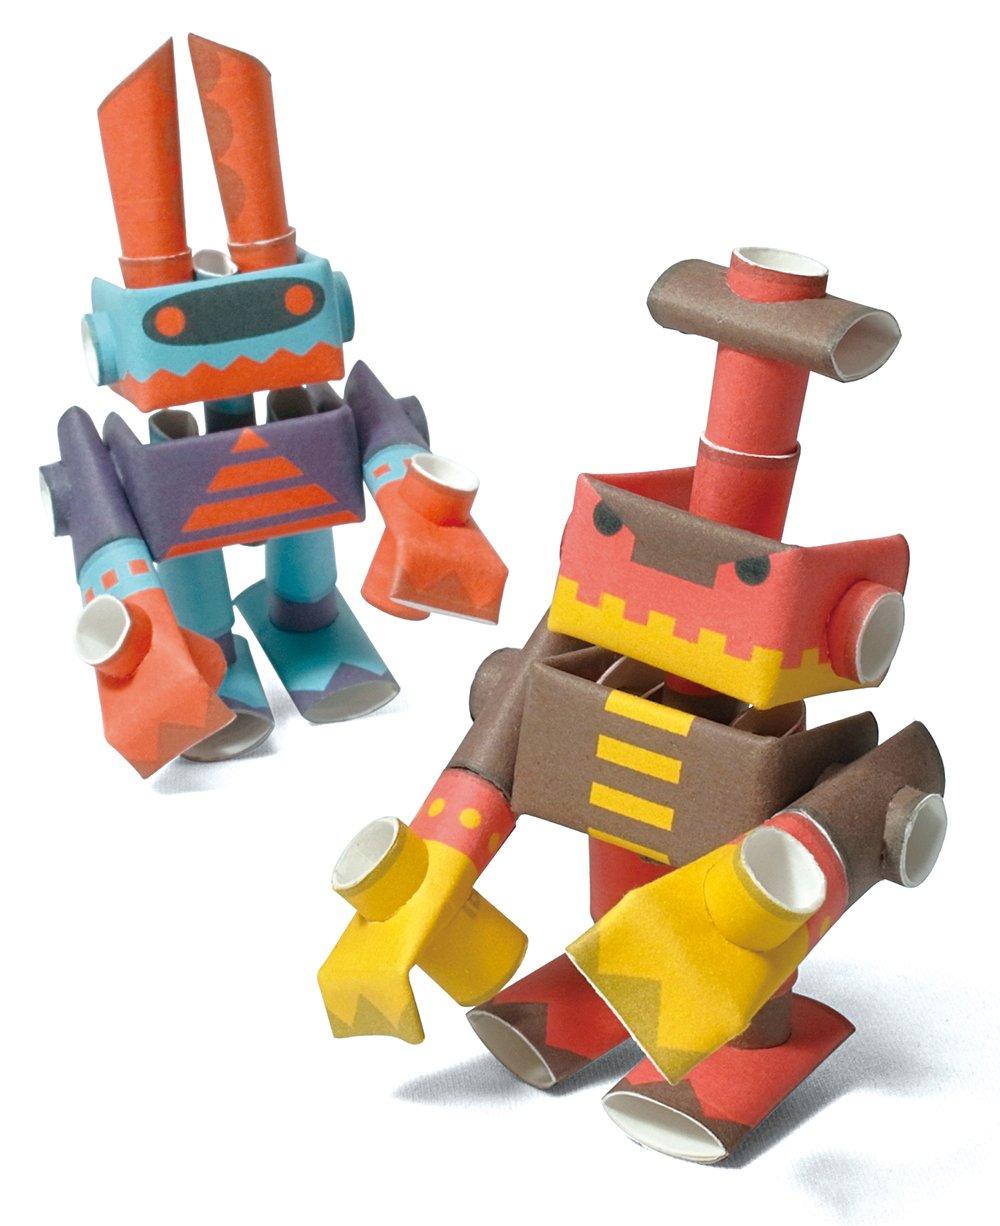 Robot Beetles KOTO CO LTD CT-pip029 PIPEROID Lift /& Pinch paper craft robot kit from Japan